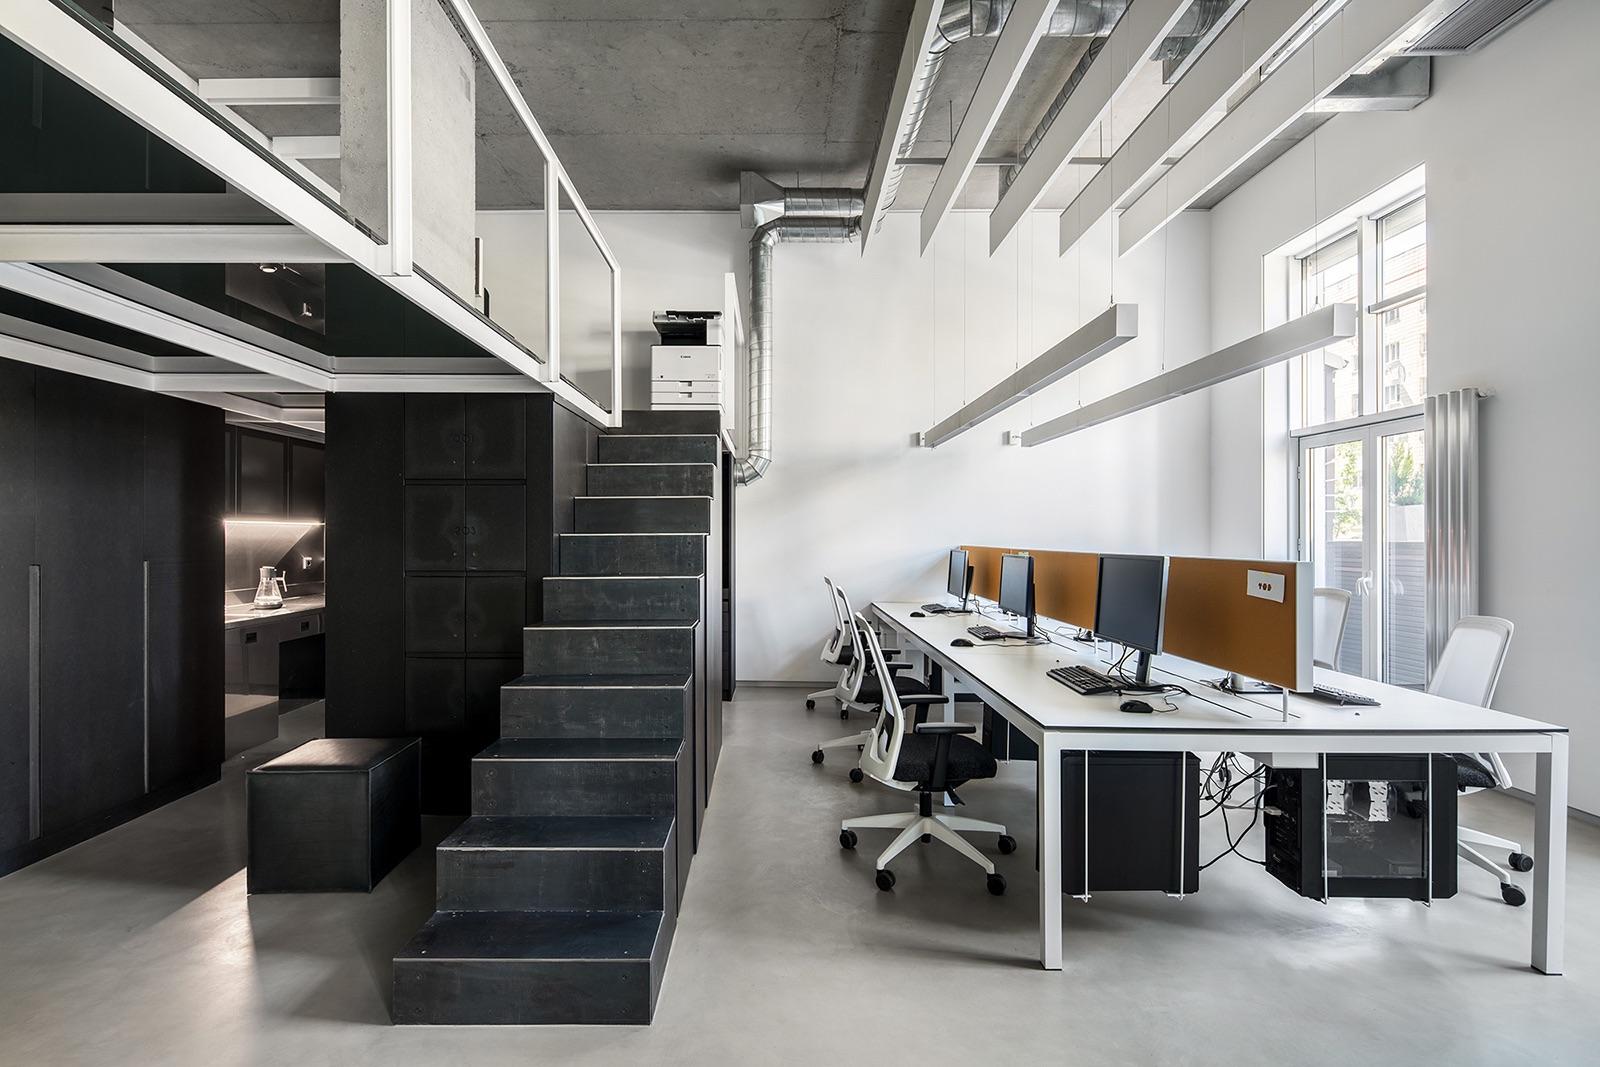 yod-design-lab-office-1